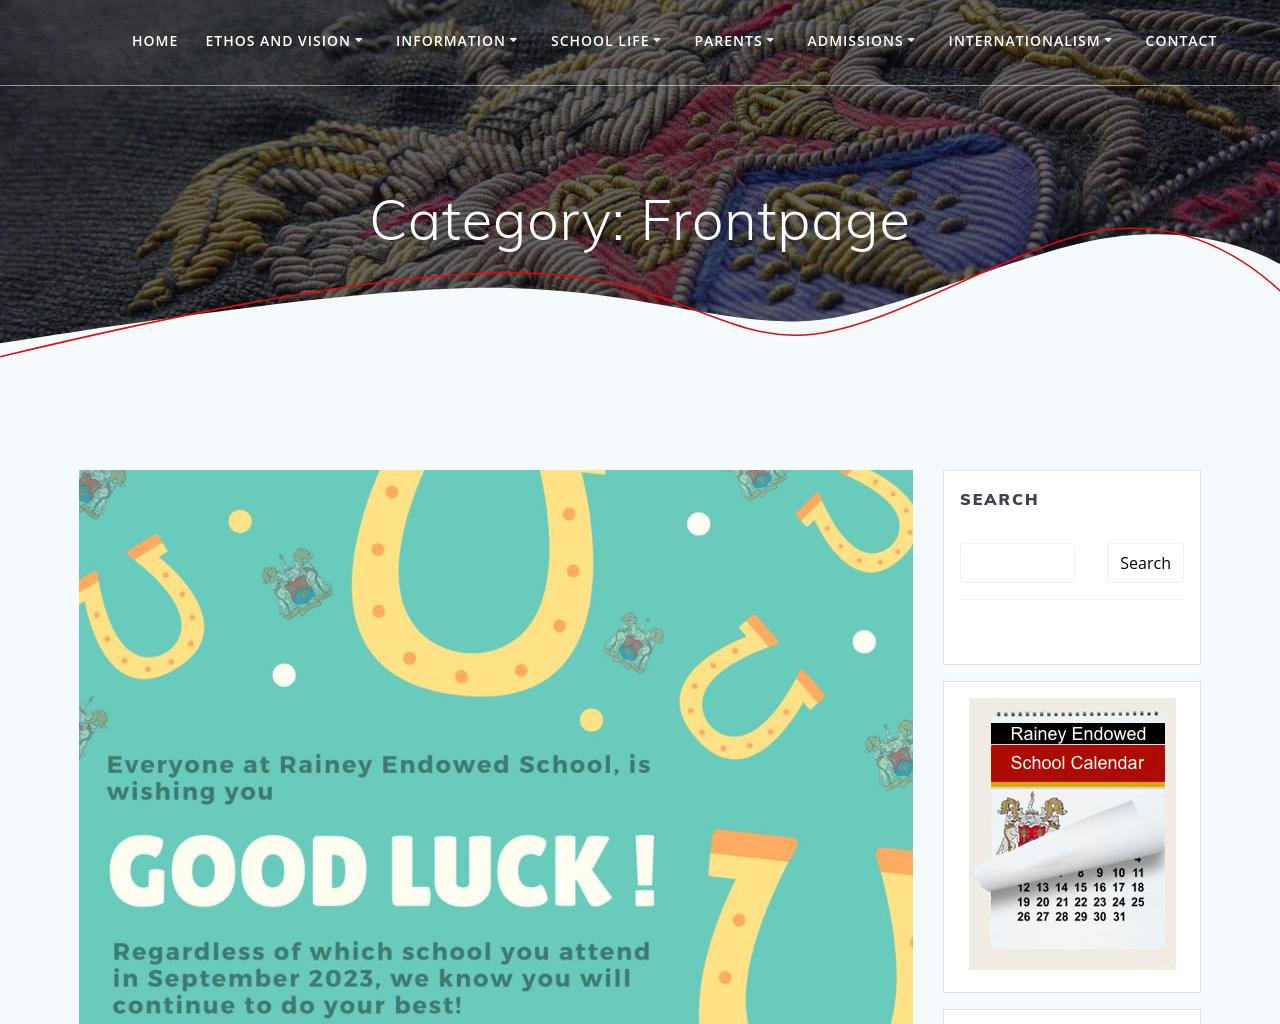 Rainey Endowed School